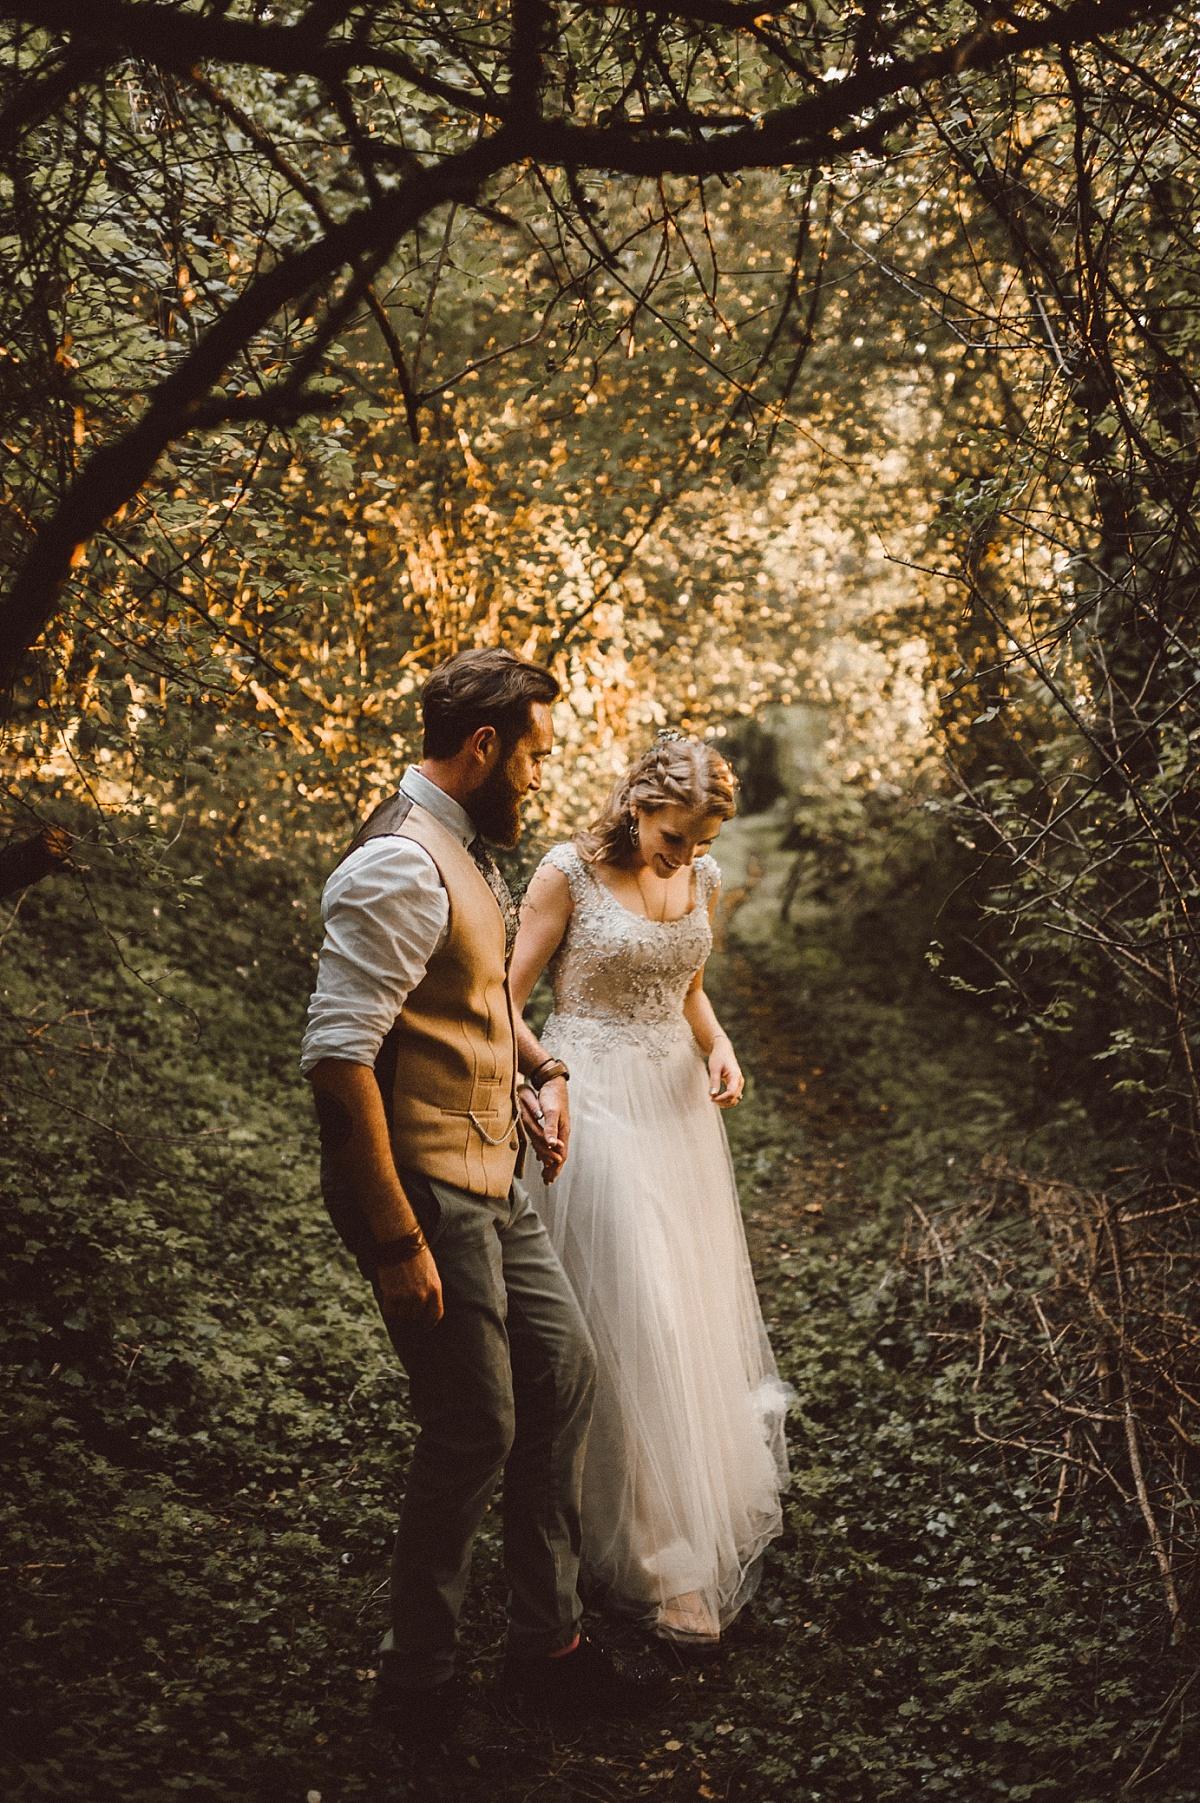 Groom leading bride down path at alternative wedding